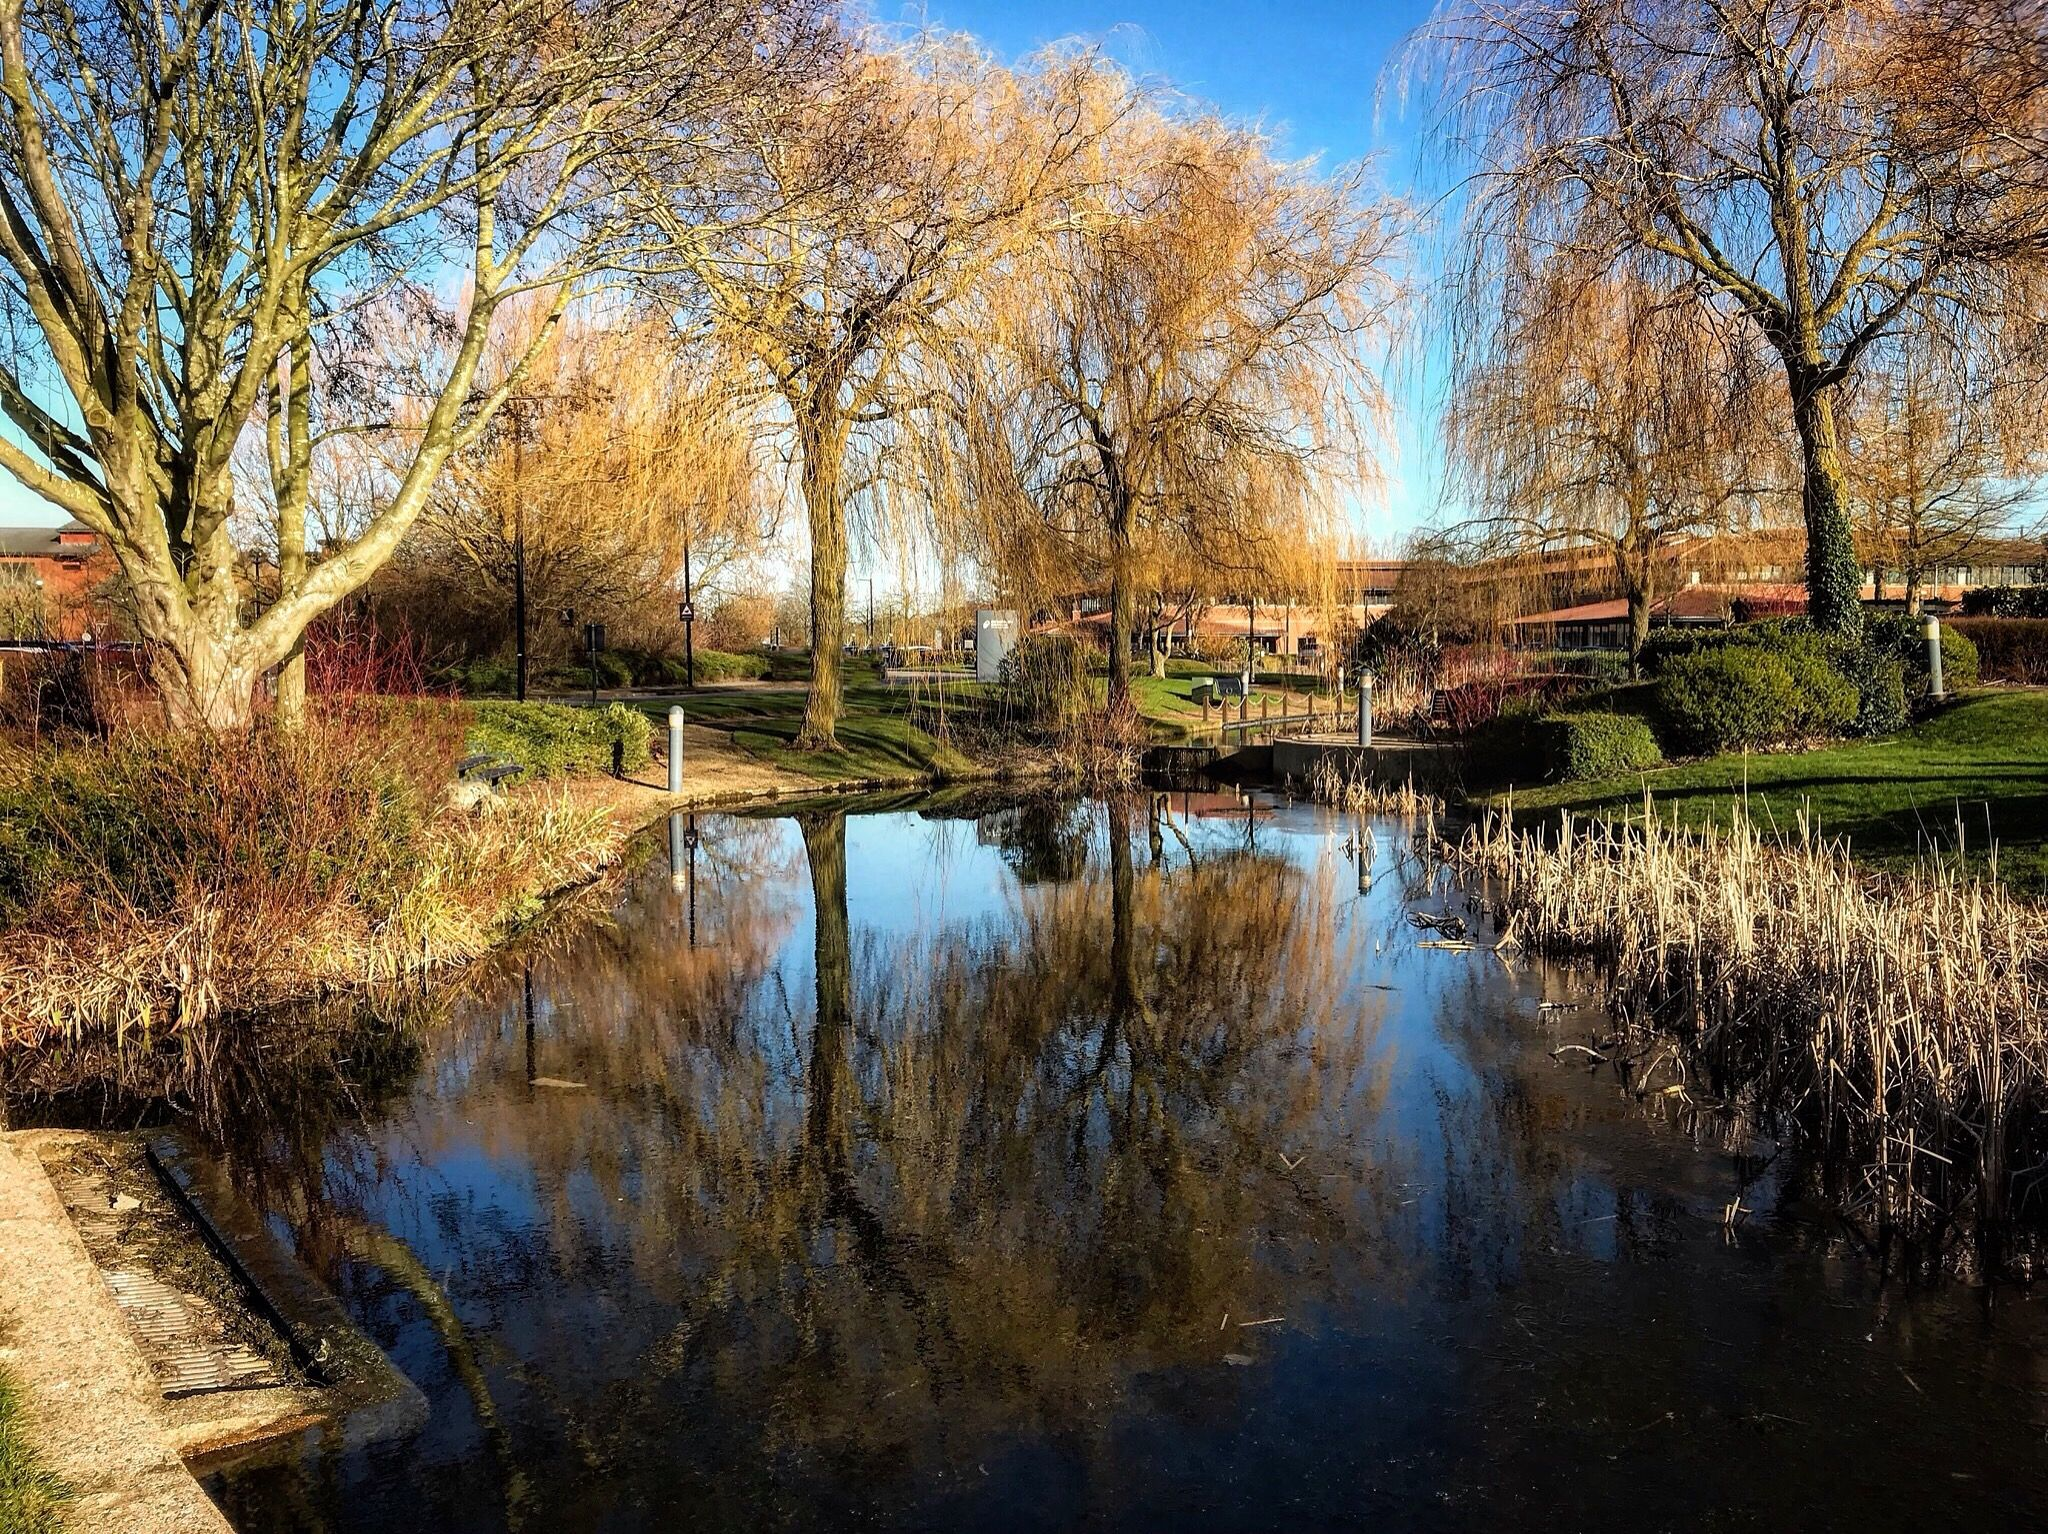 Caldecotte lake reflections